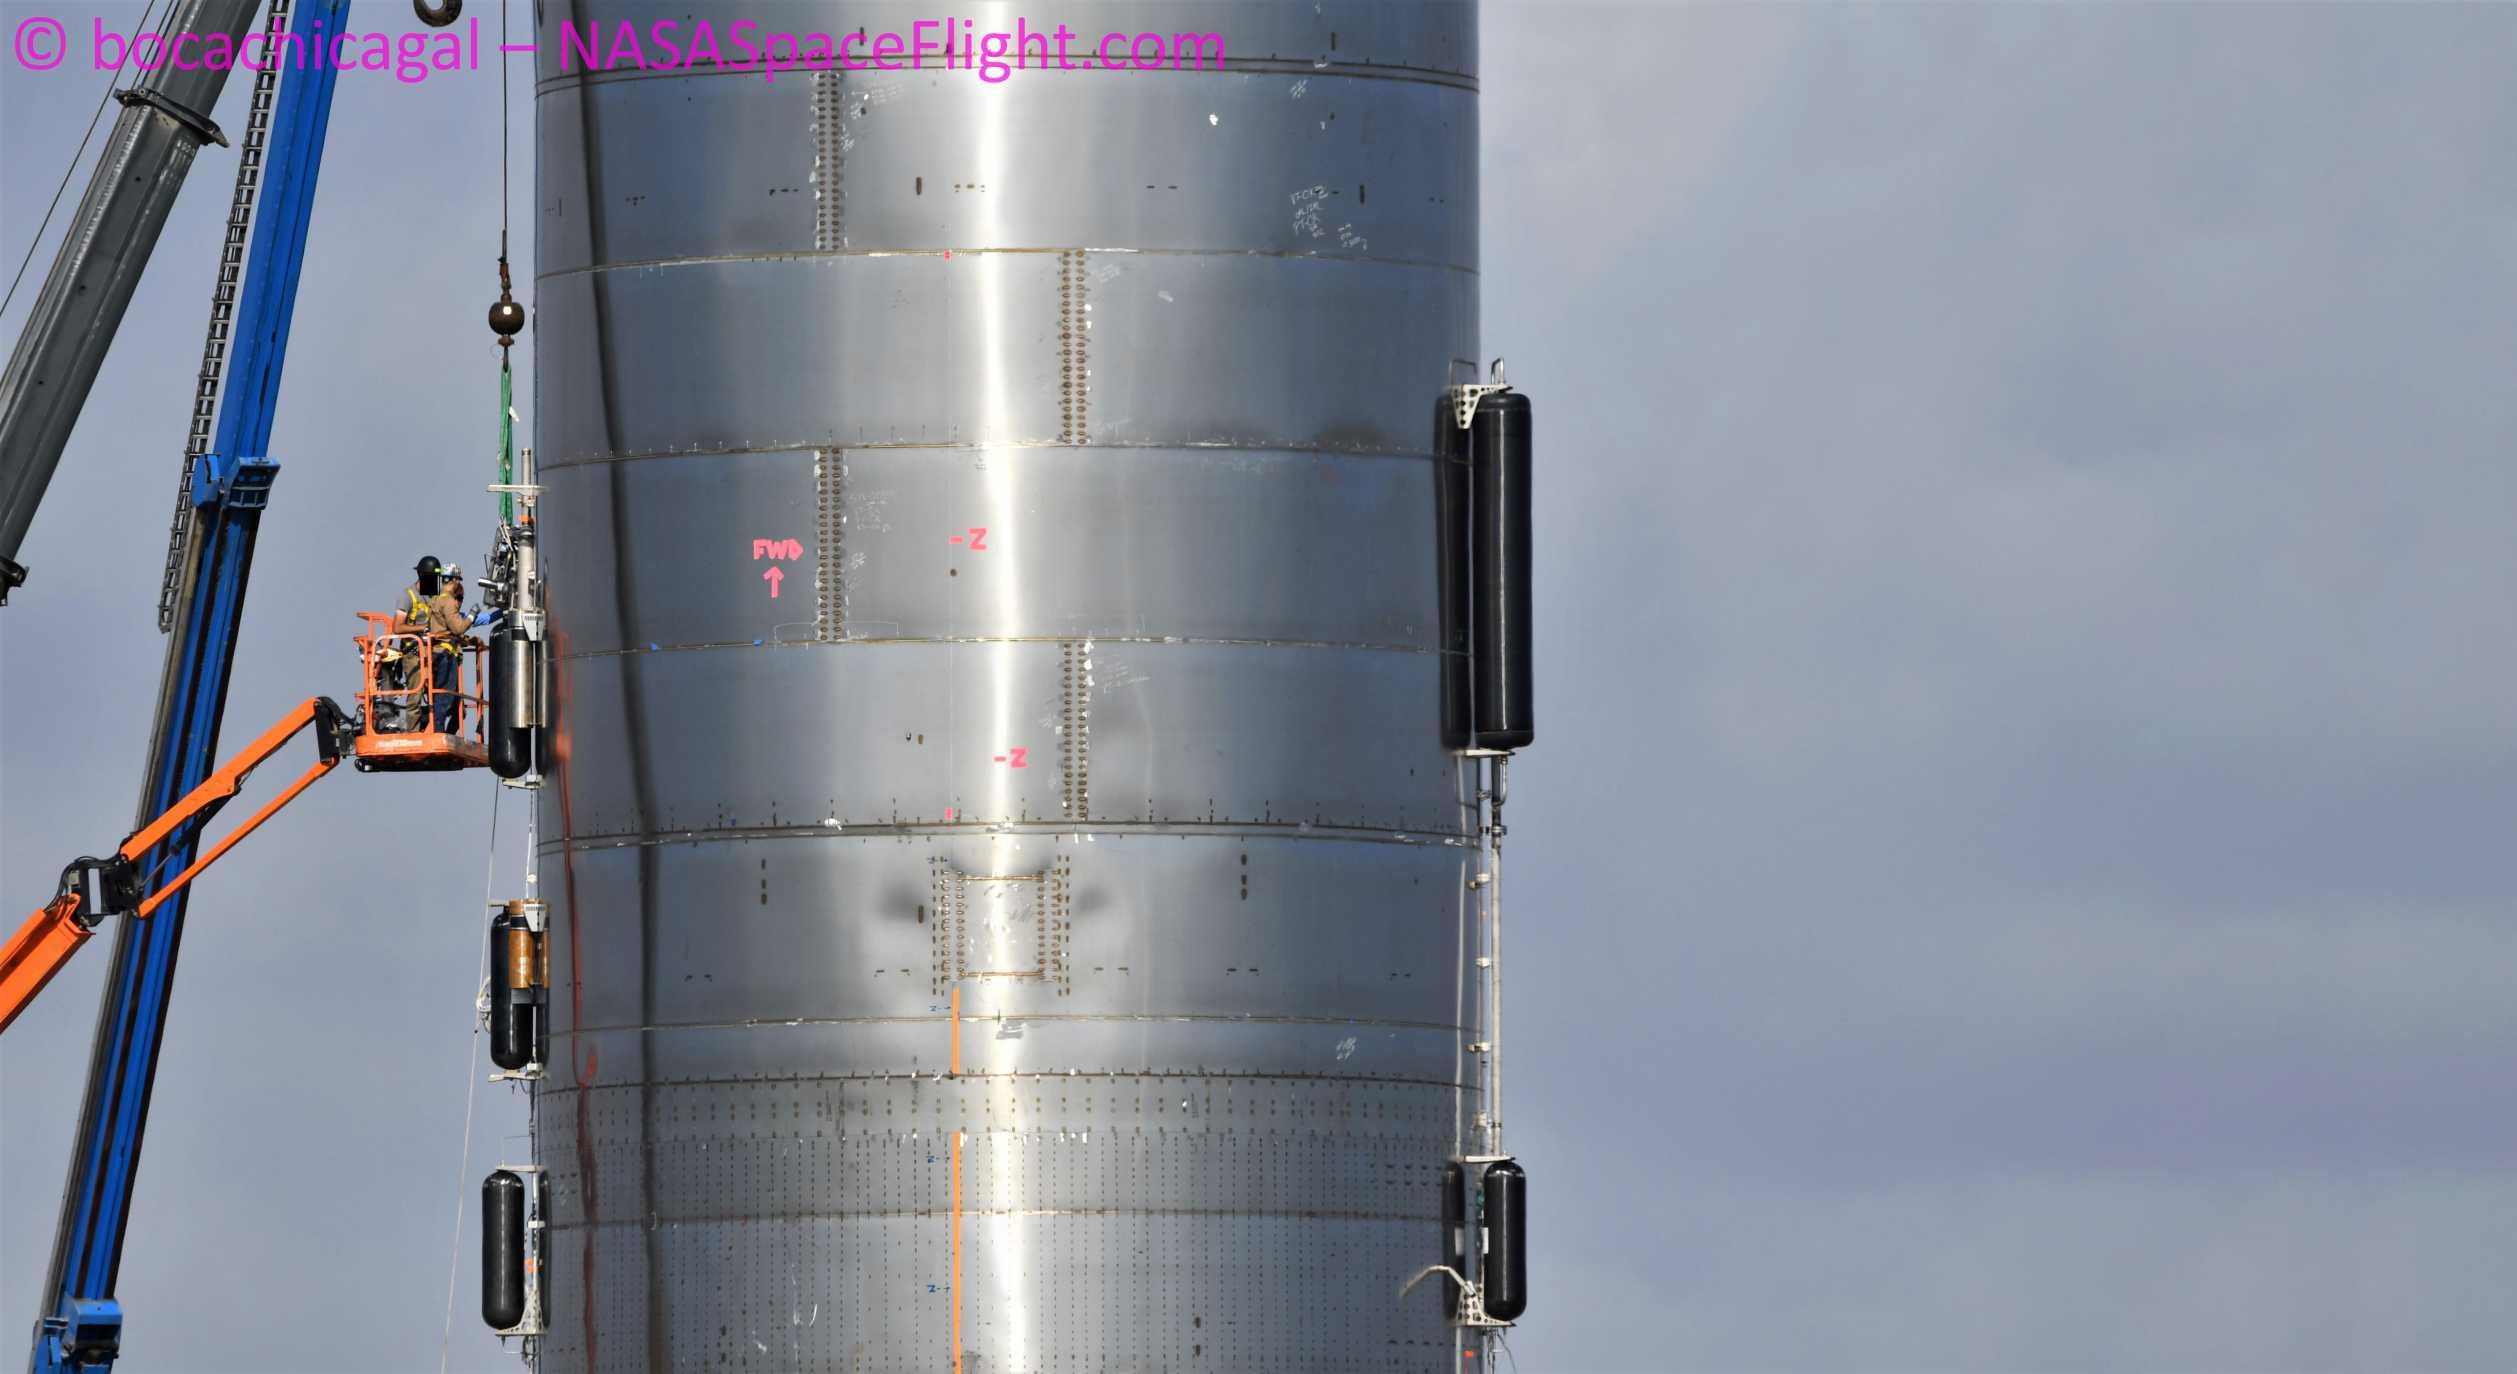 Starship Boca Chica 051020 (NASASpaceflight – bocachicagal) SN4 1 edit (c)